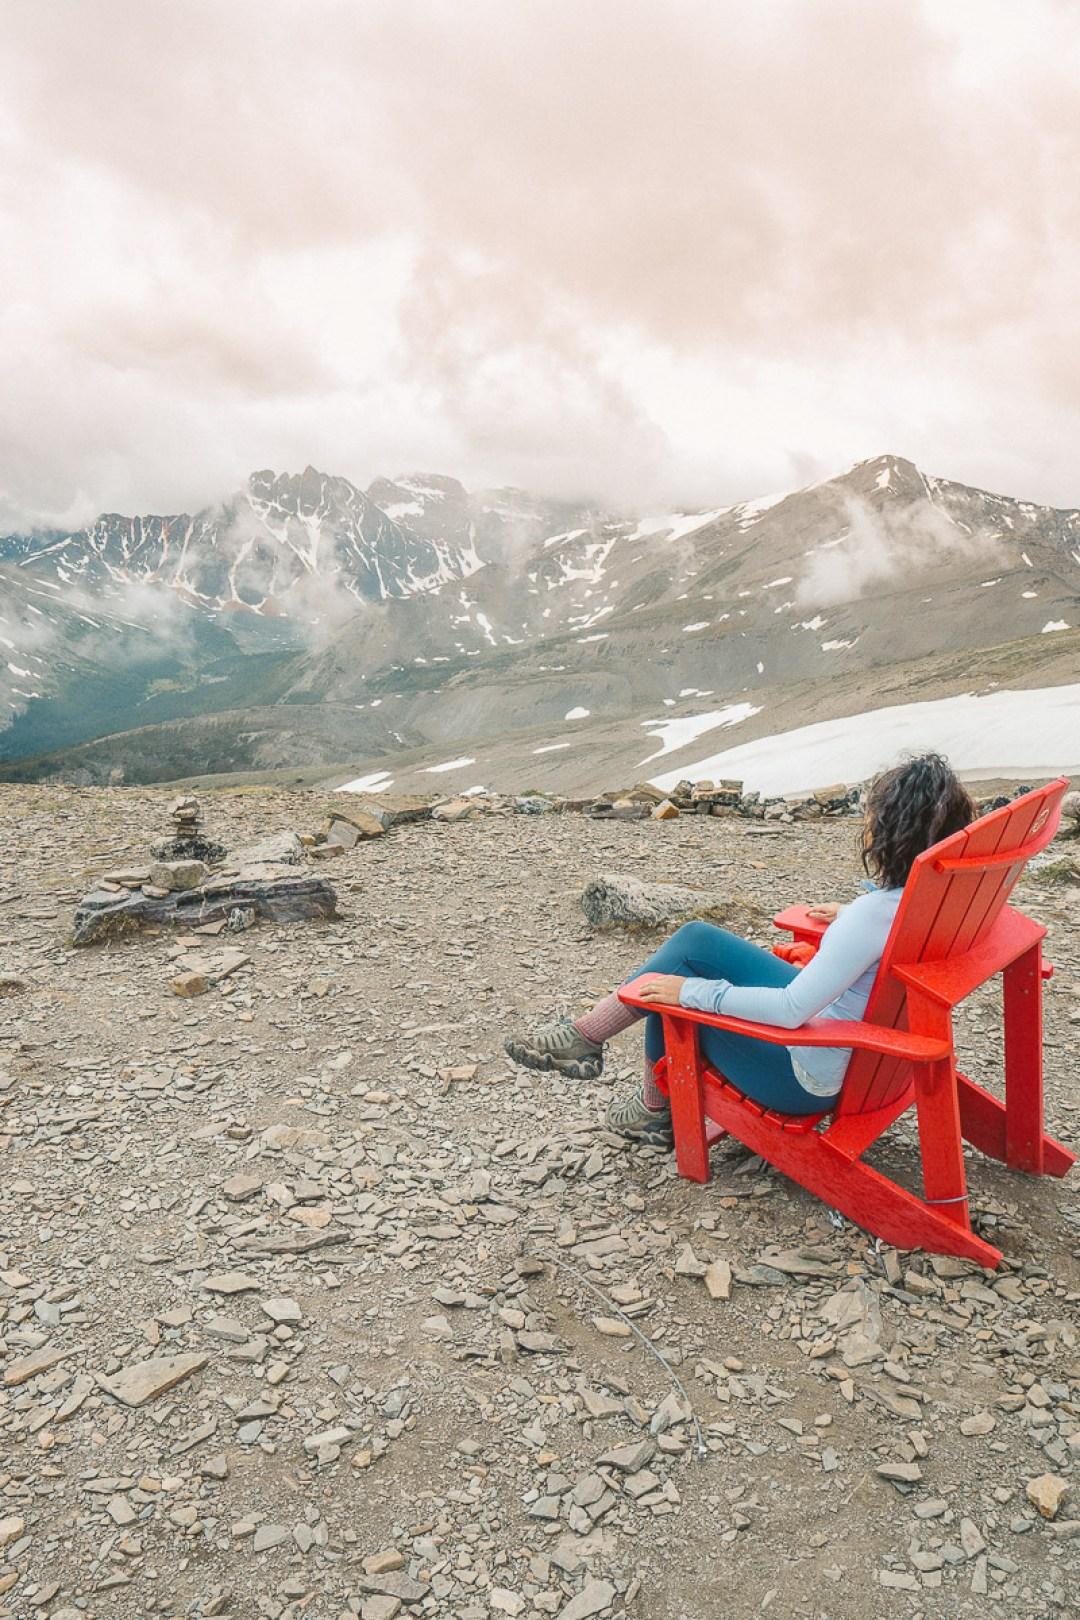 5 Reasons To Visit Jasper National Park